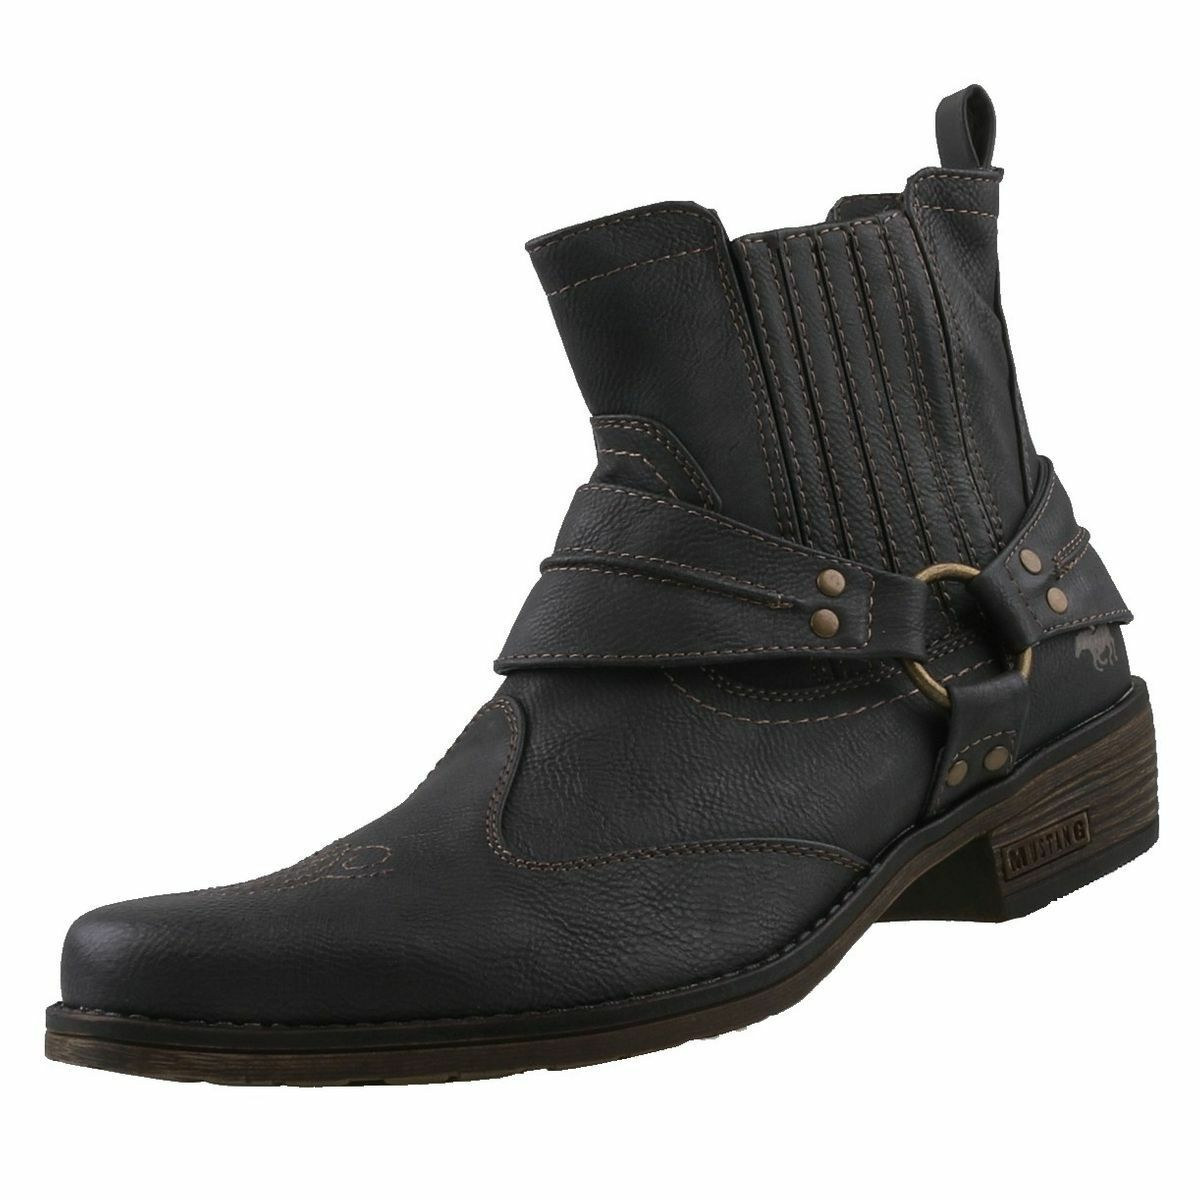 NEU Mustang Herrenschuhe Schuhe Western-Stiefel Cowboystiefel Herren Stiefel    | Ästhetisches Aussehen